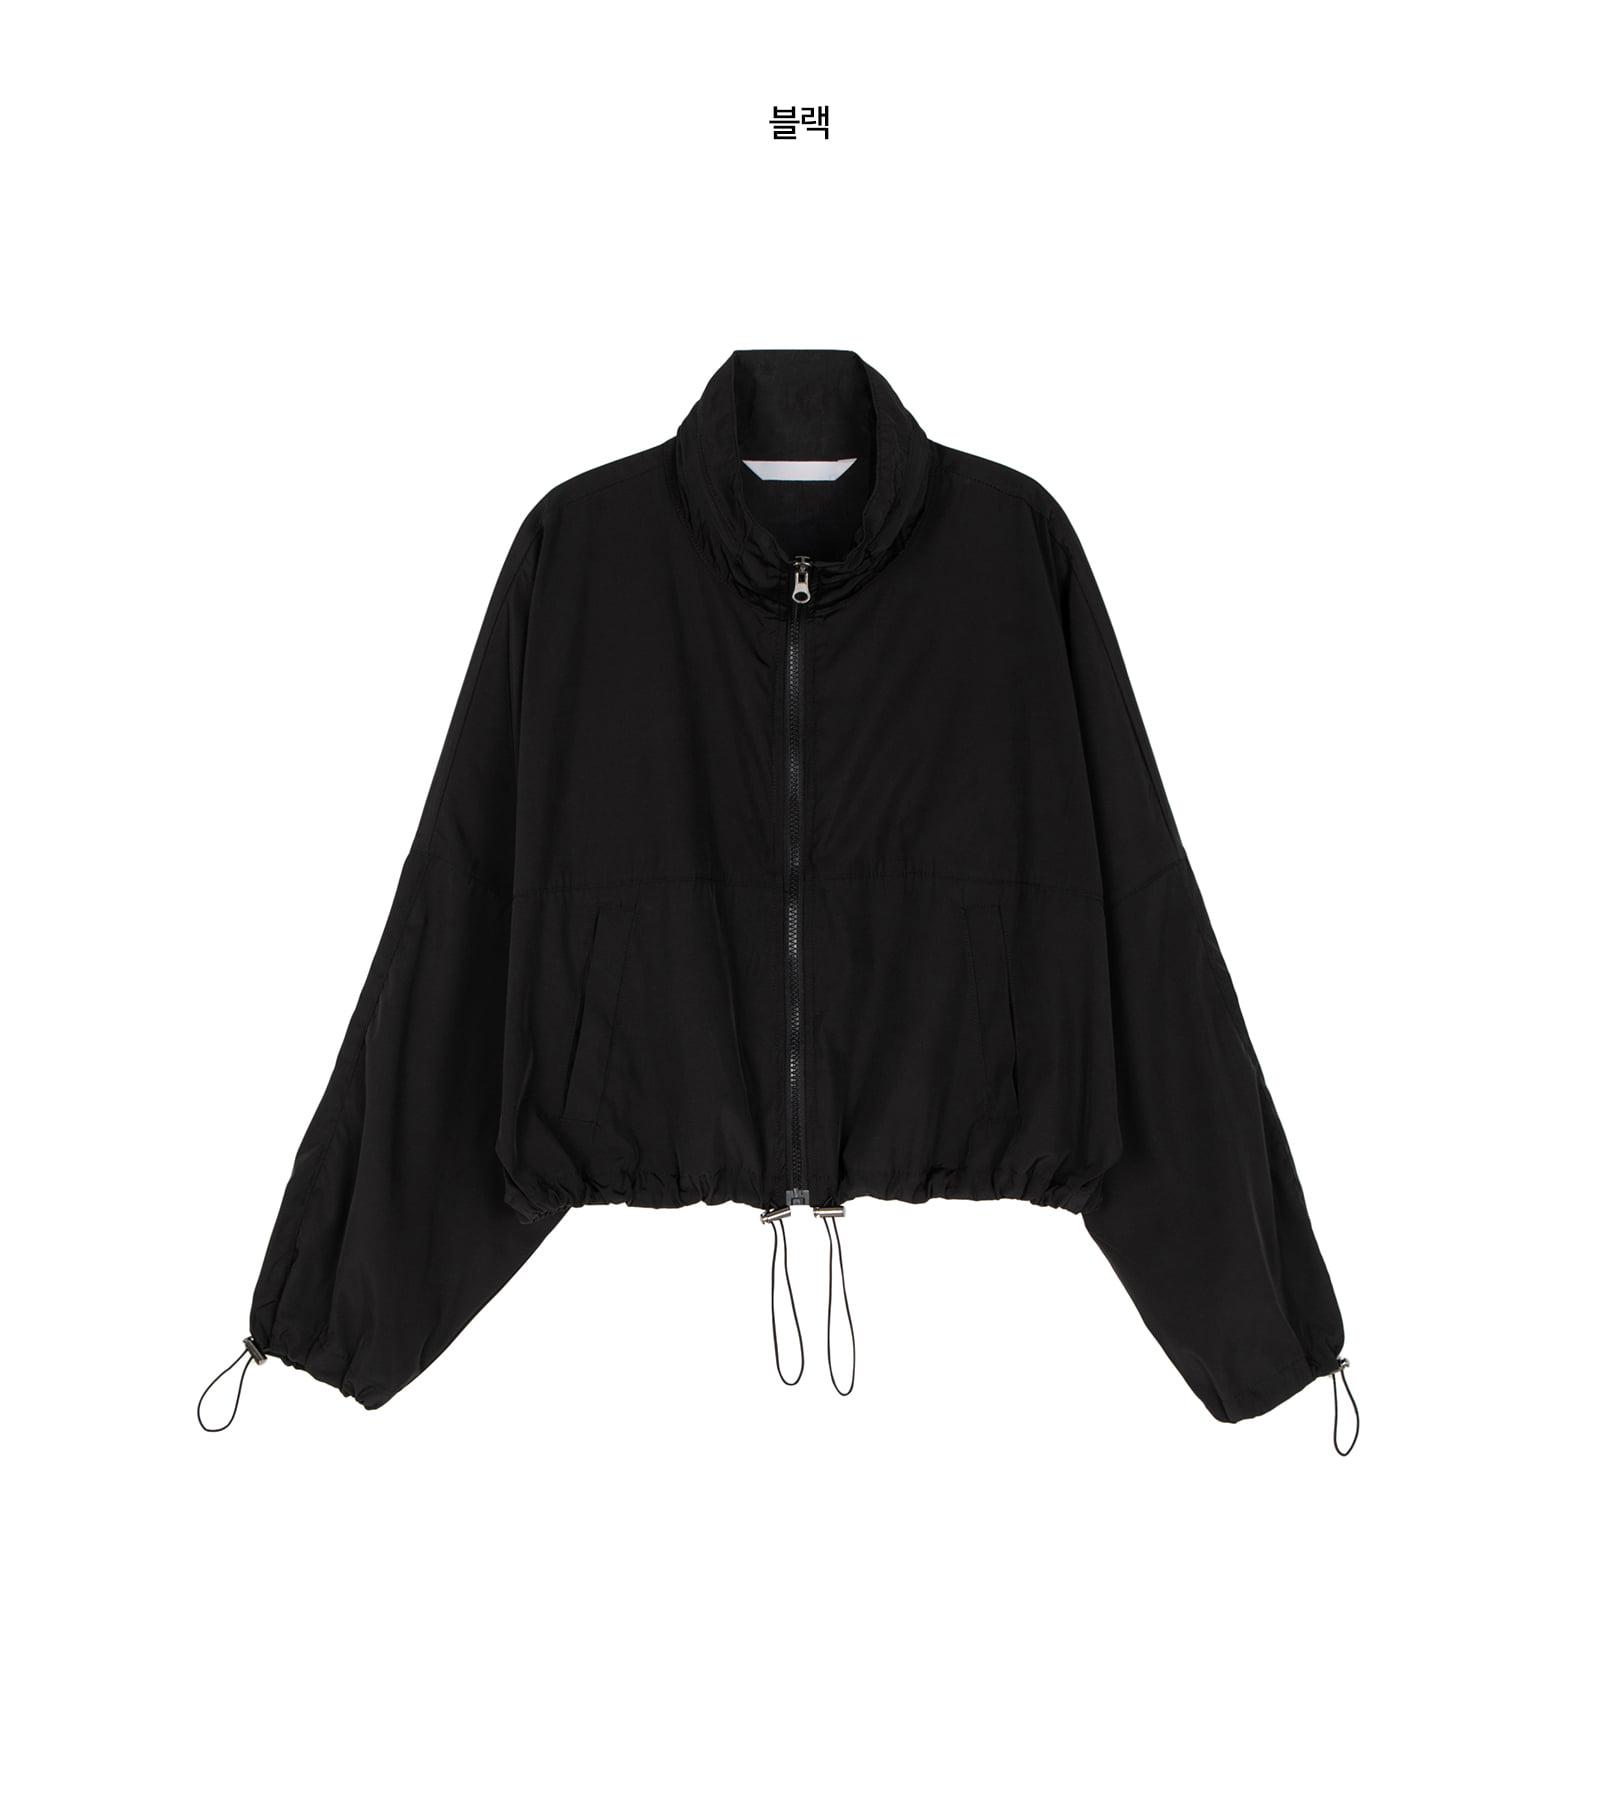 Fly balloon string bomber jacket